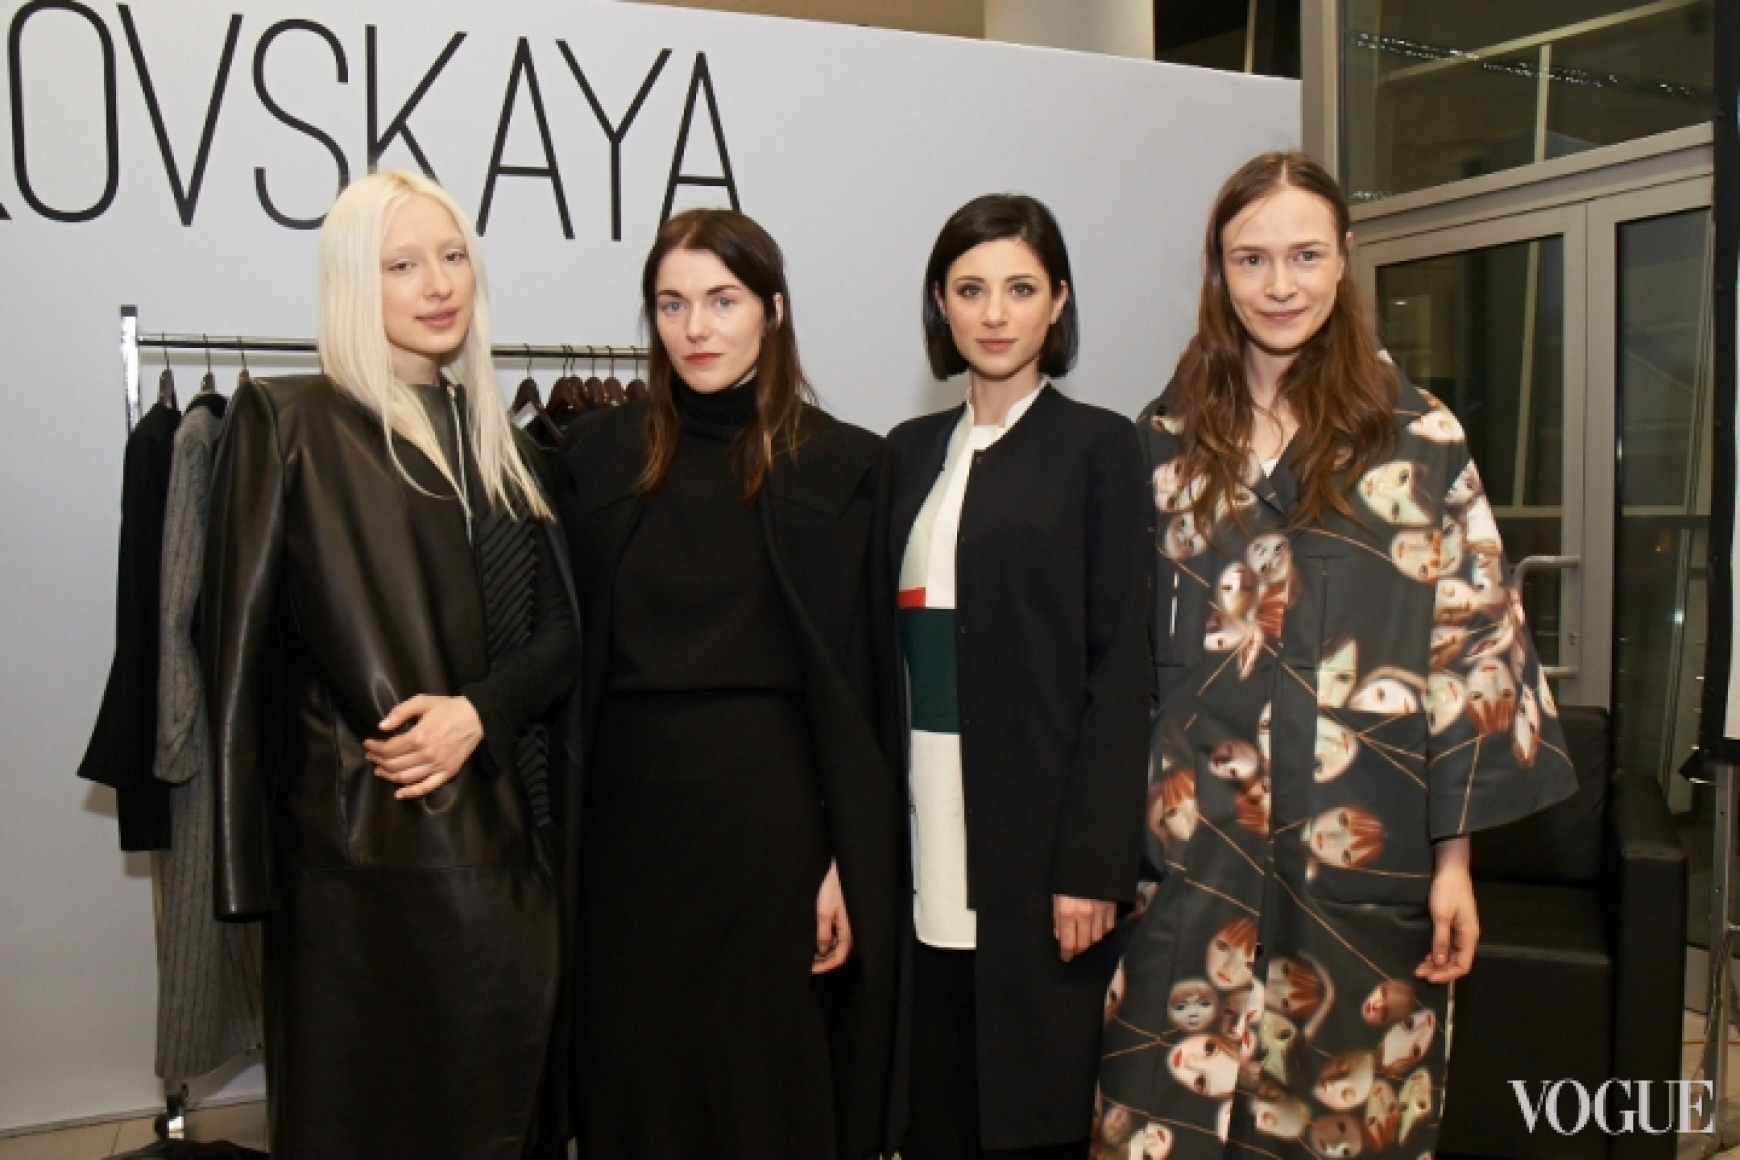 Olimpia Whitemustache, Лиля Литковская, Светлана Бевза, Надя Шаповал